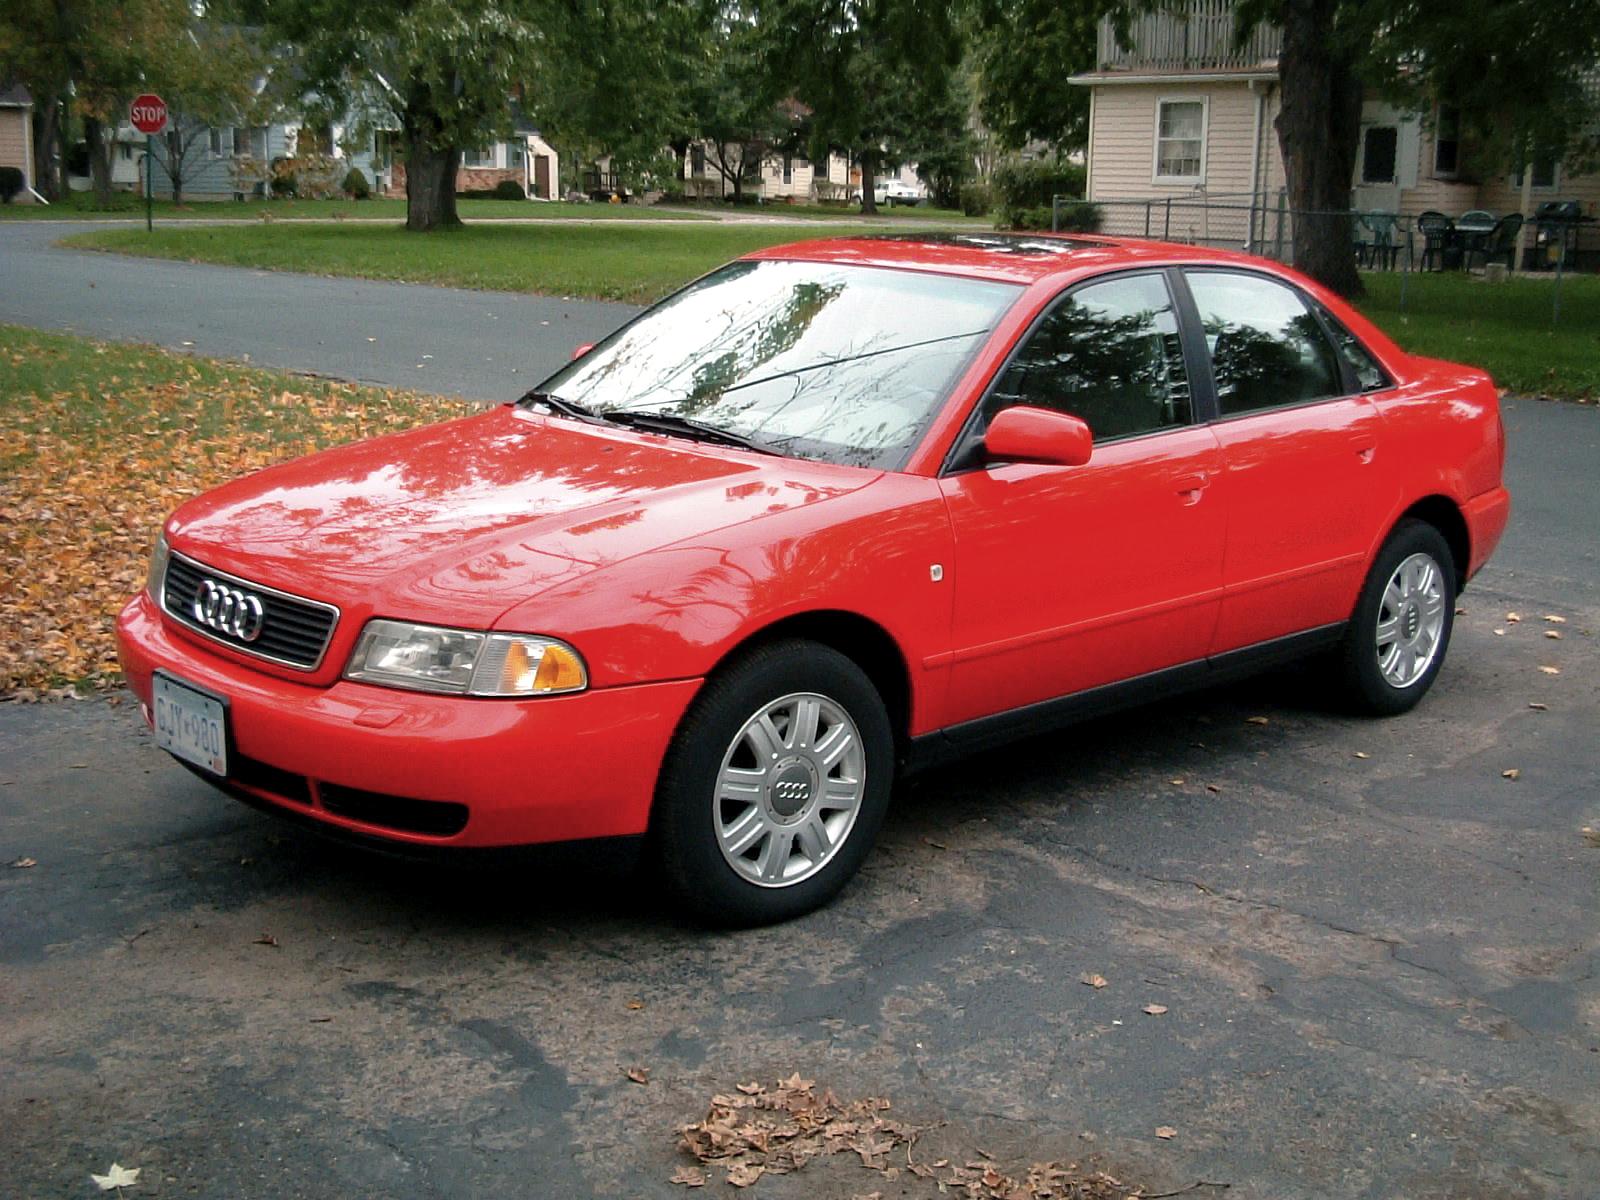 1998 Audi A4 Image 8